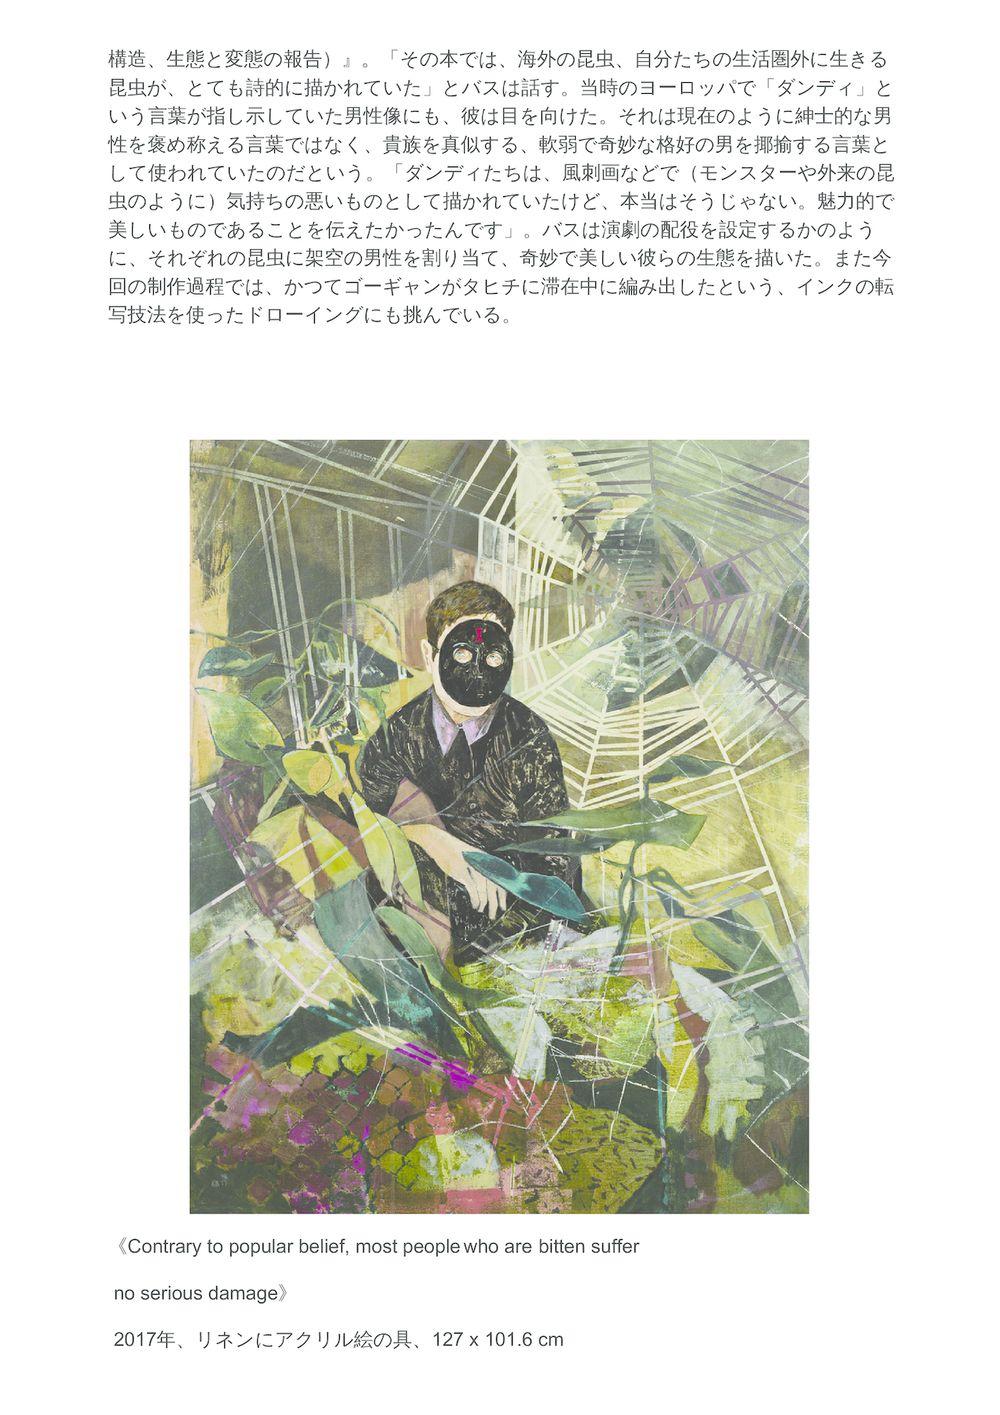 T Japan | Hernan BAS